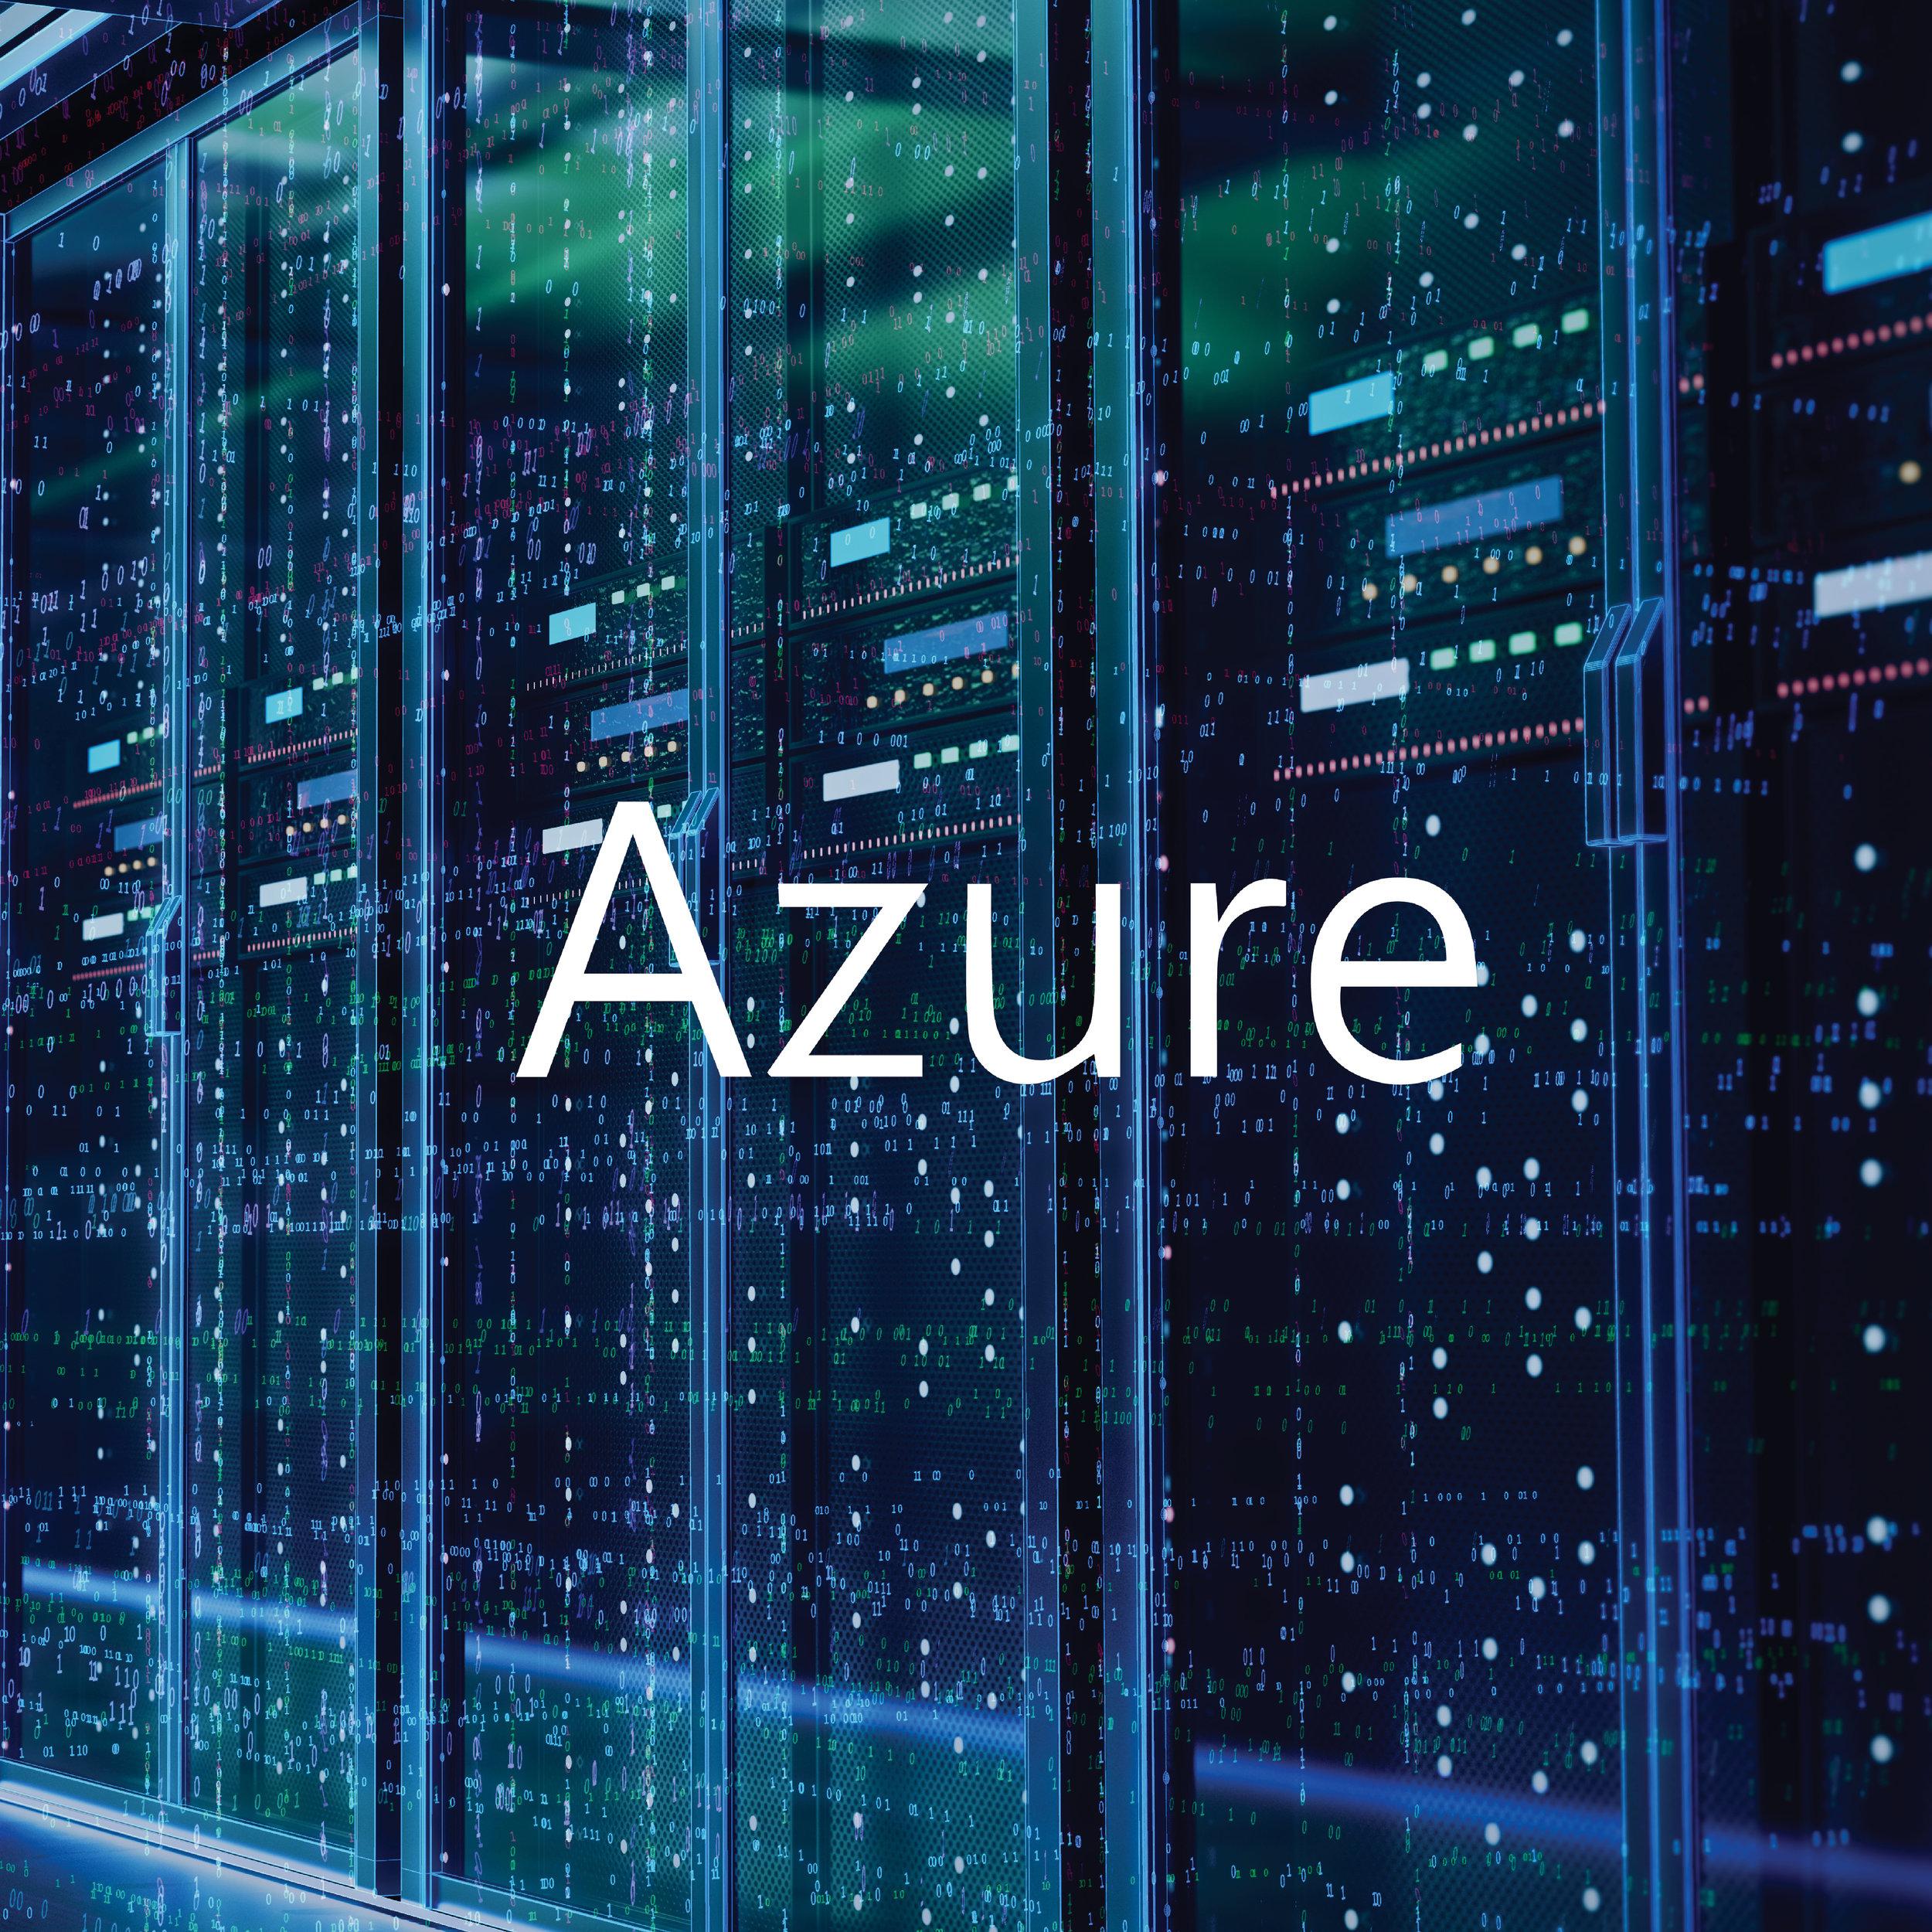 Azure (Microsoft)